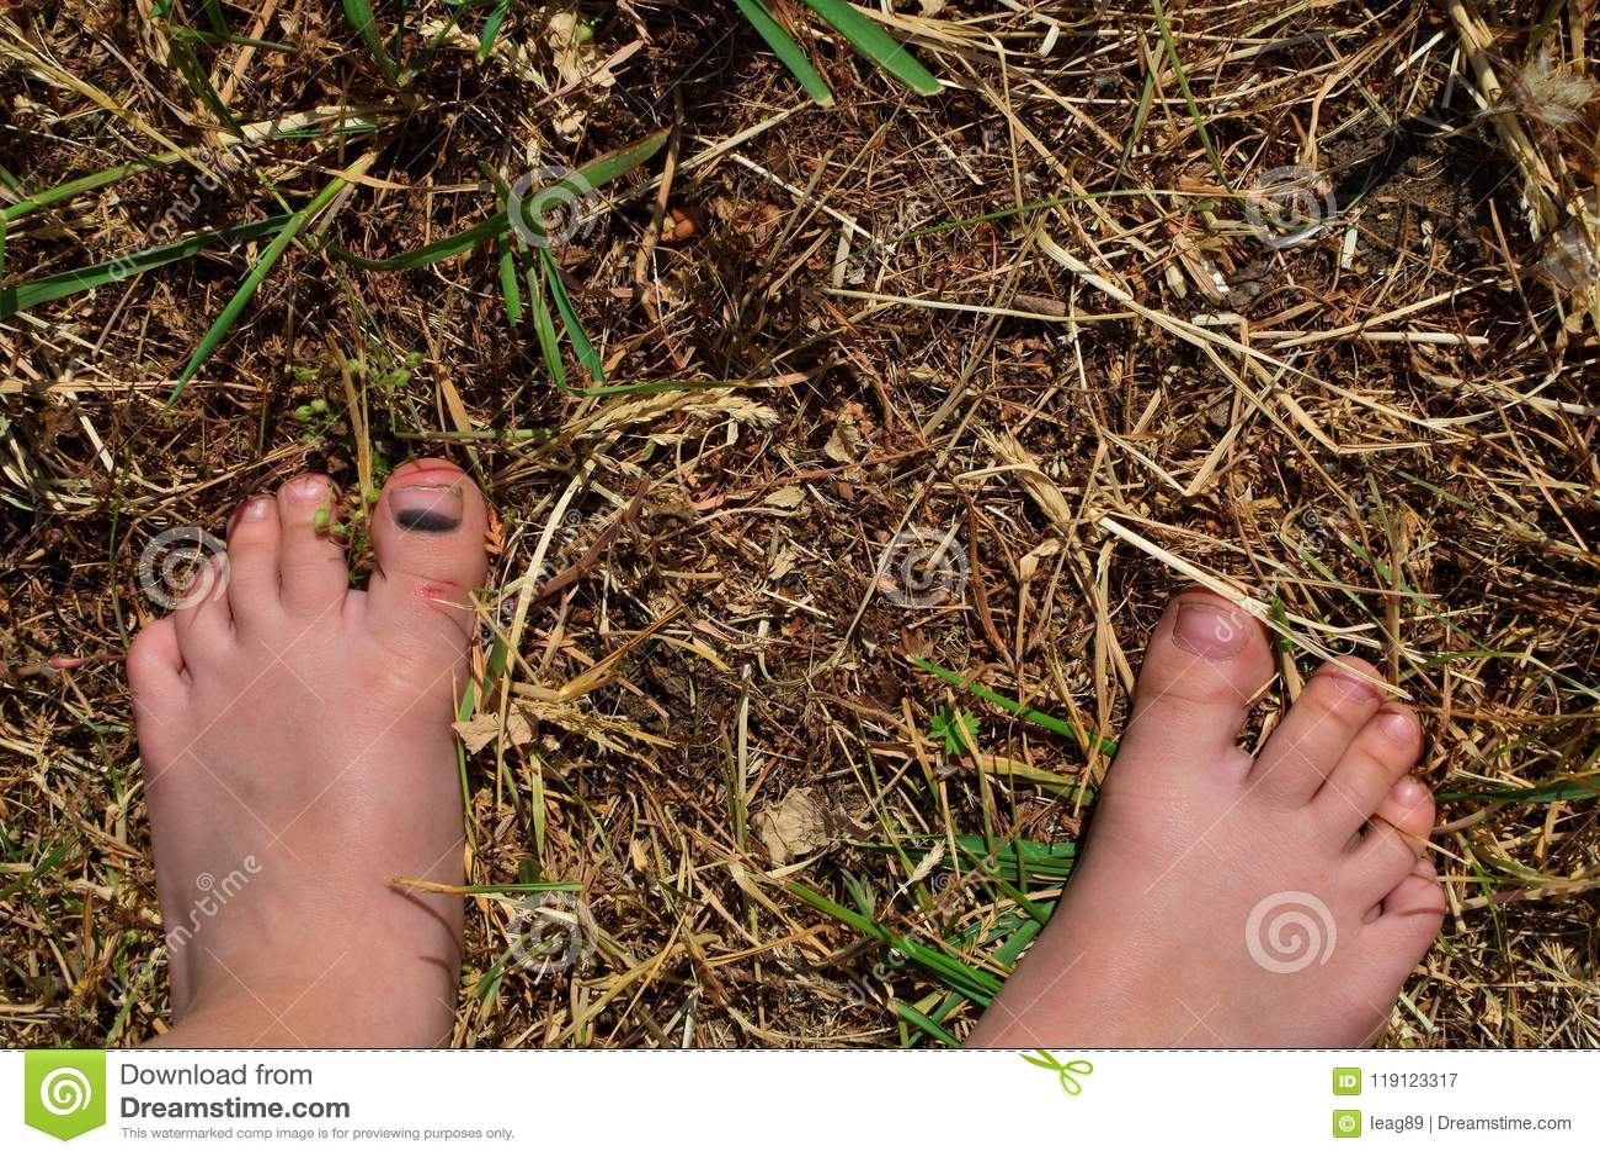 Bare feet of child